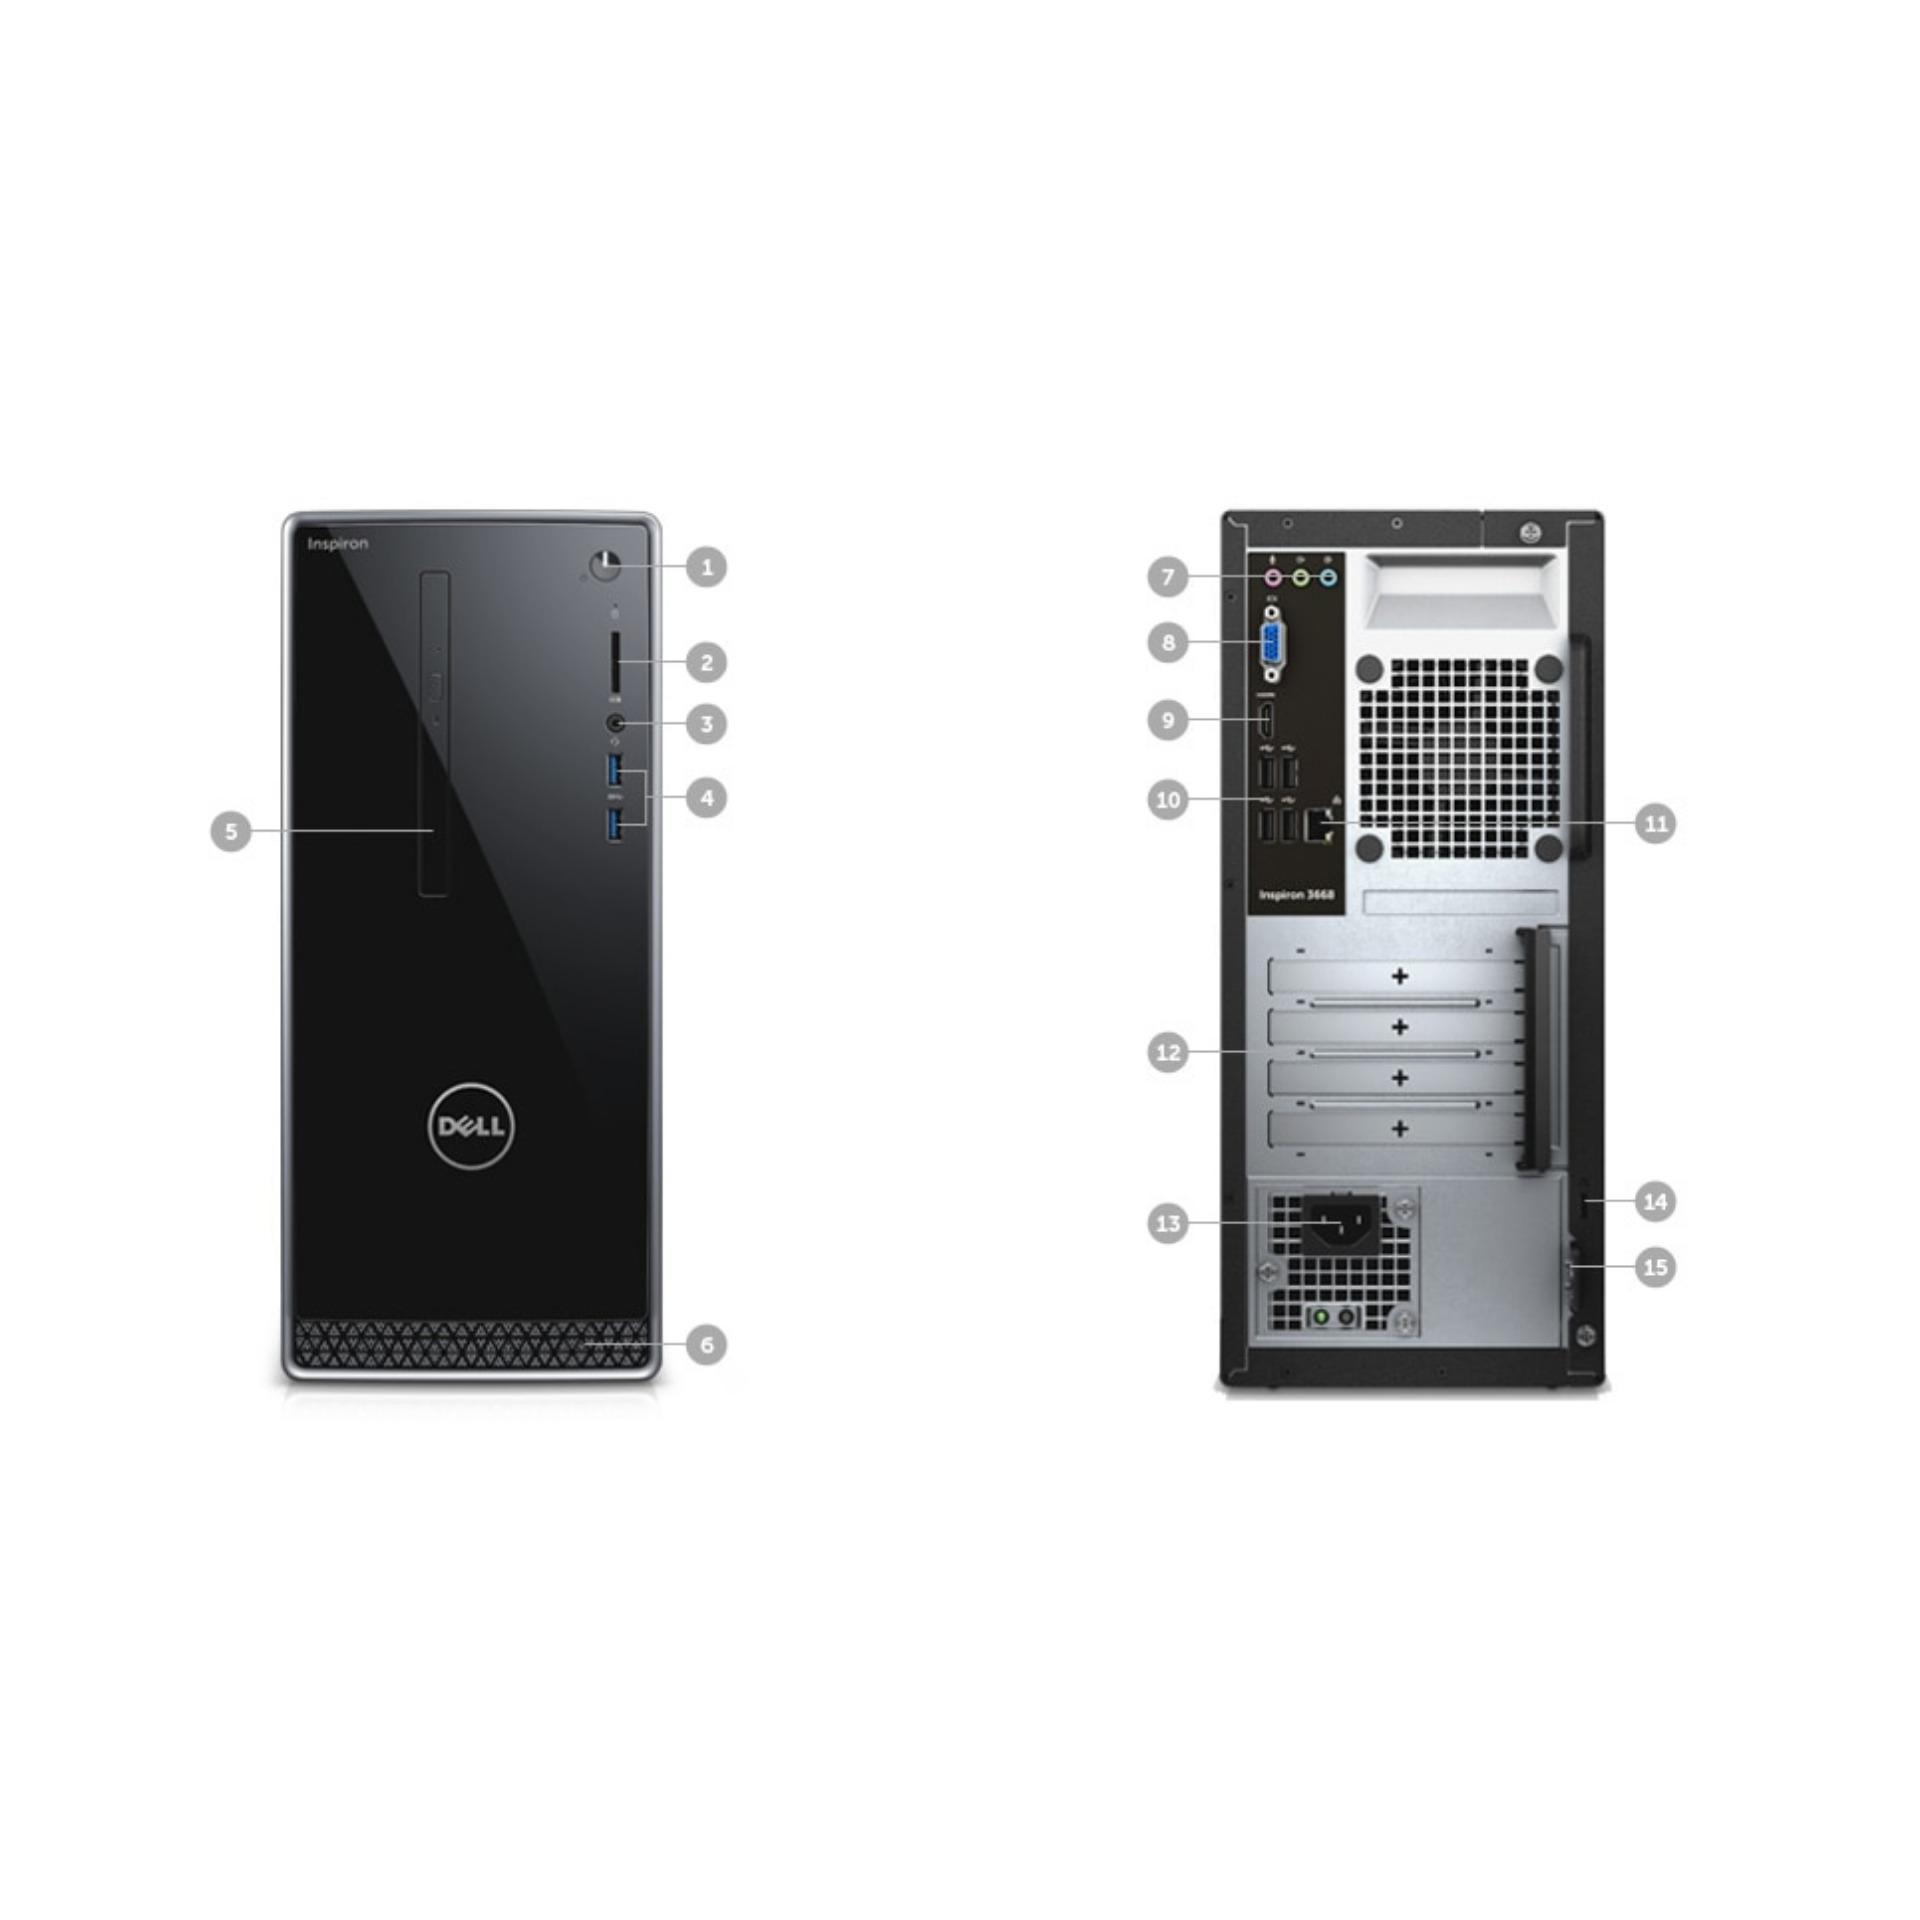 INSPIRON DESKTOP 3668 New 7th Gen Intel Core i5 7400 8GB RAM 128GB SSD+ 1TB NVIDIAR GeForceR GT 1030 with 2GB GDDR5 Graphics Memory